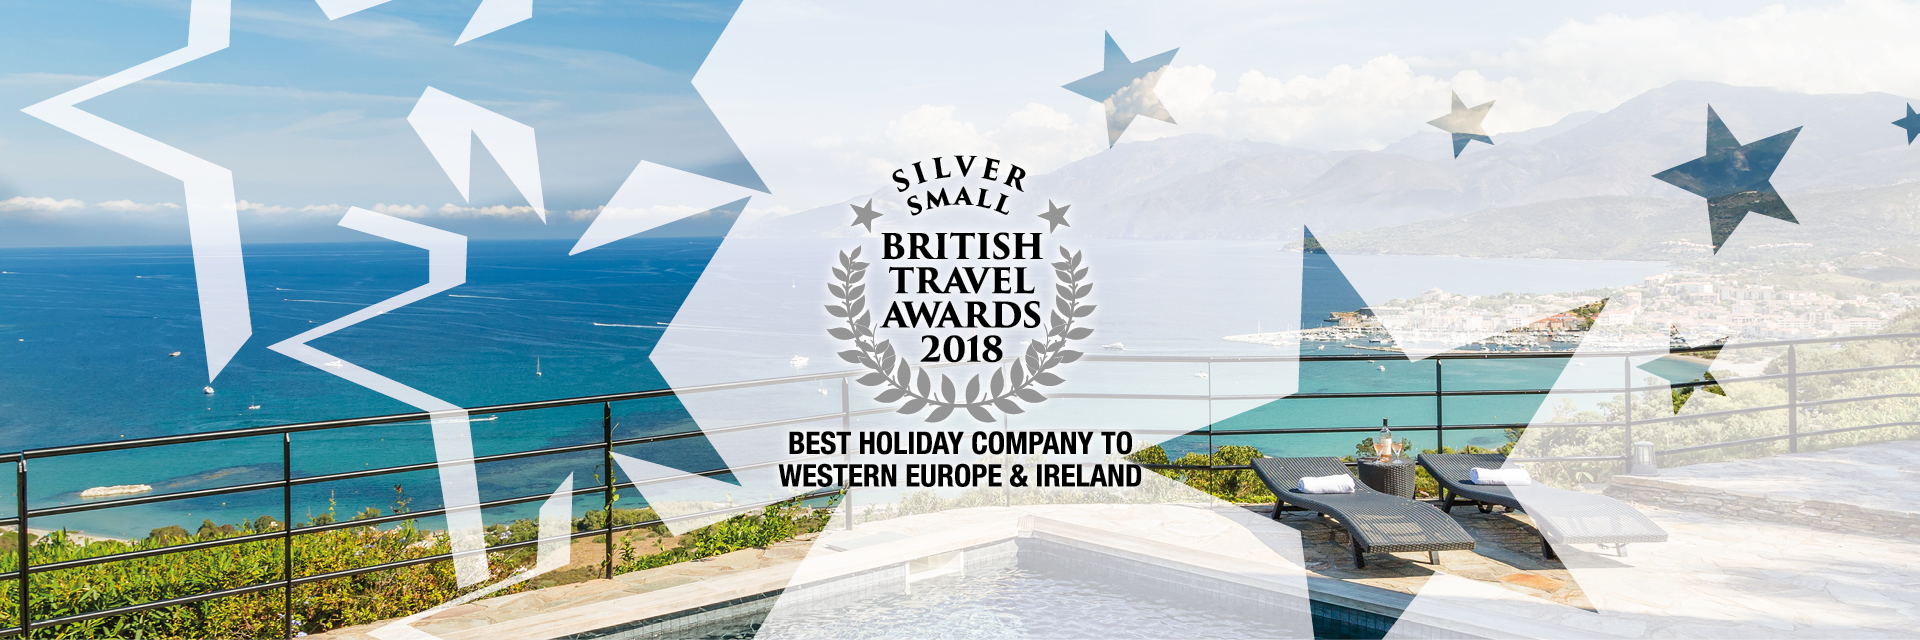 British Travel Awards 2018 - Best Holiday Company To Western Europe &